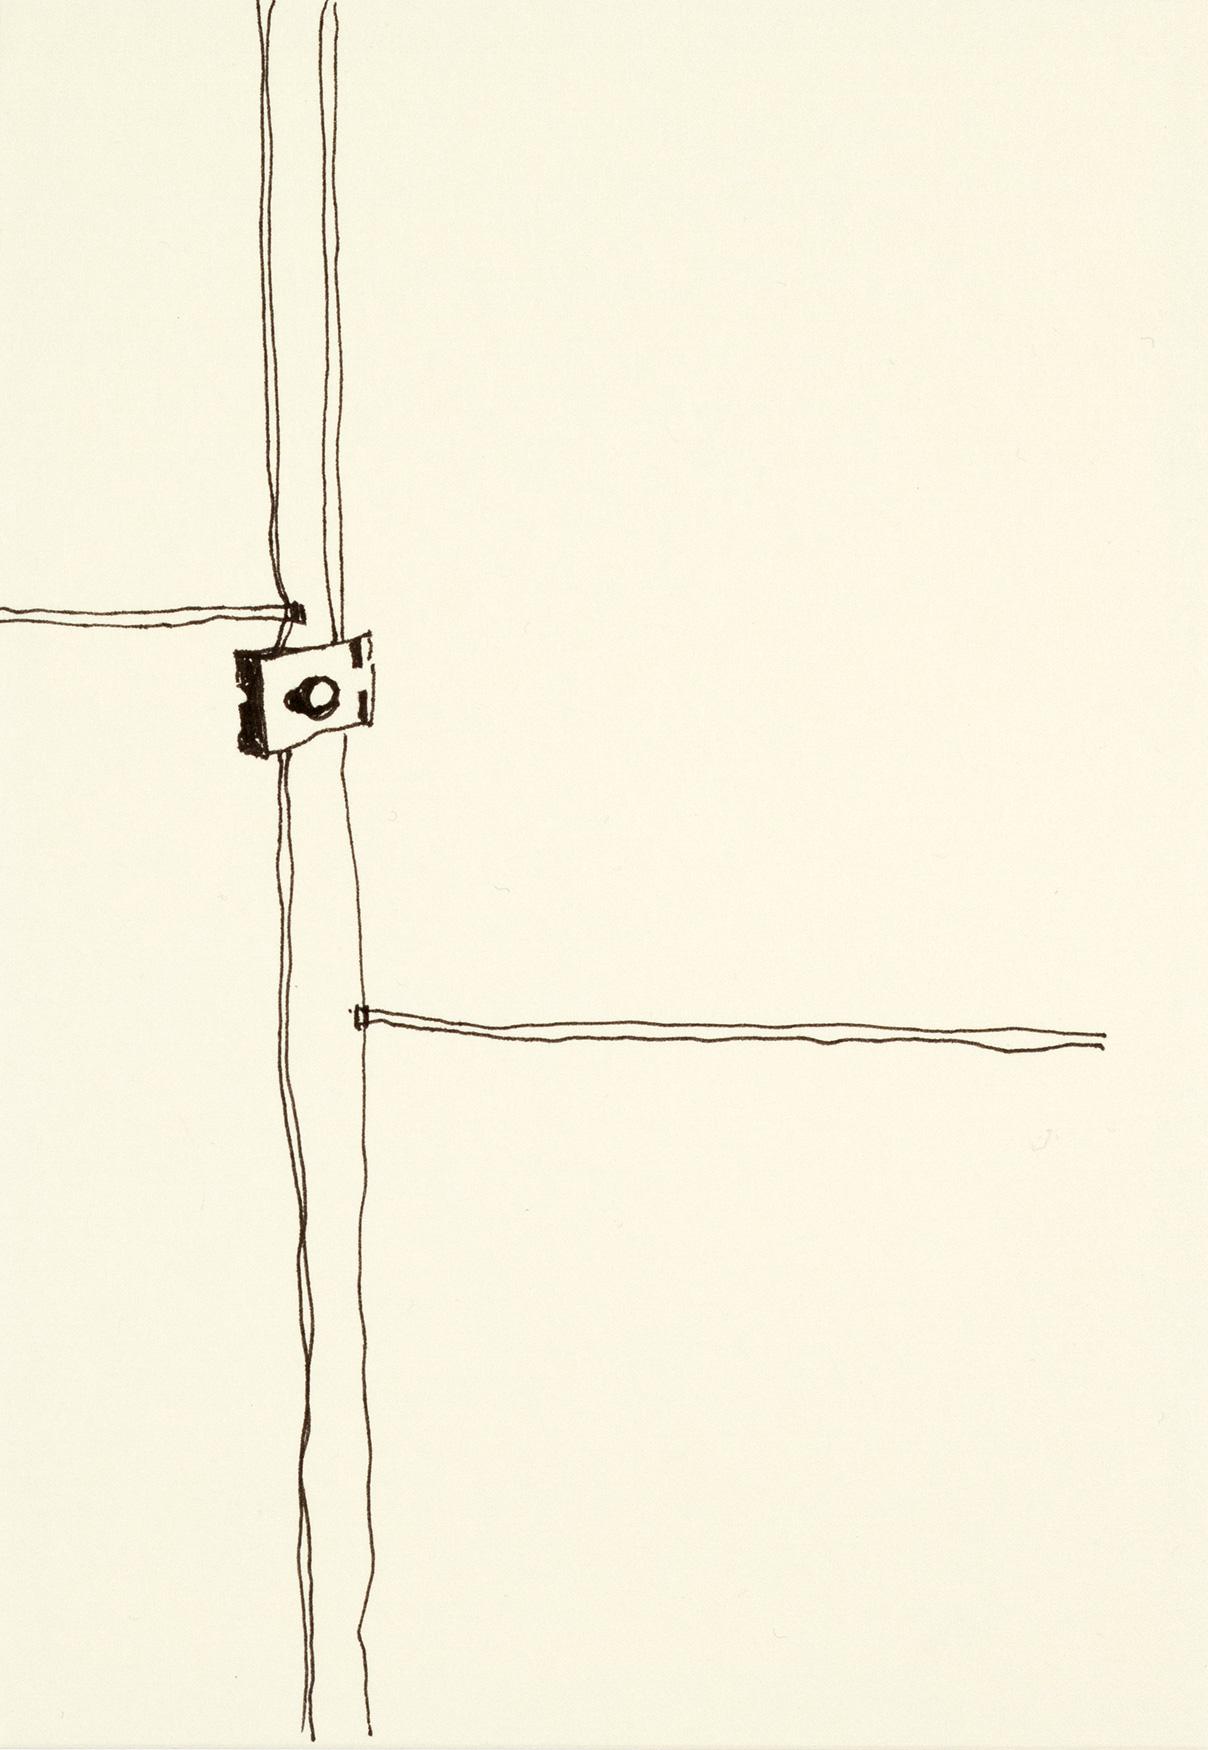 Gitter, mit links, 2015Fineliner, Papier21 x 15 cm